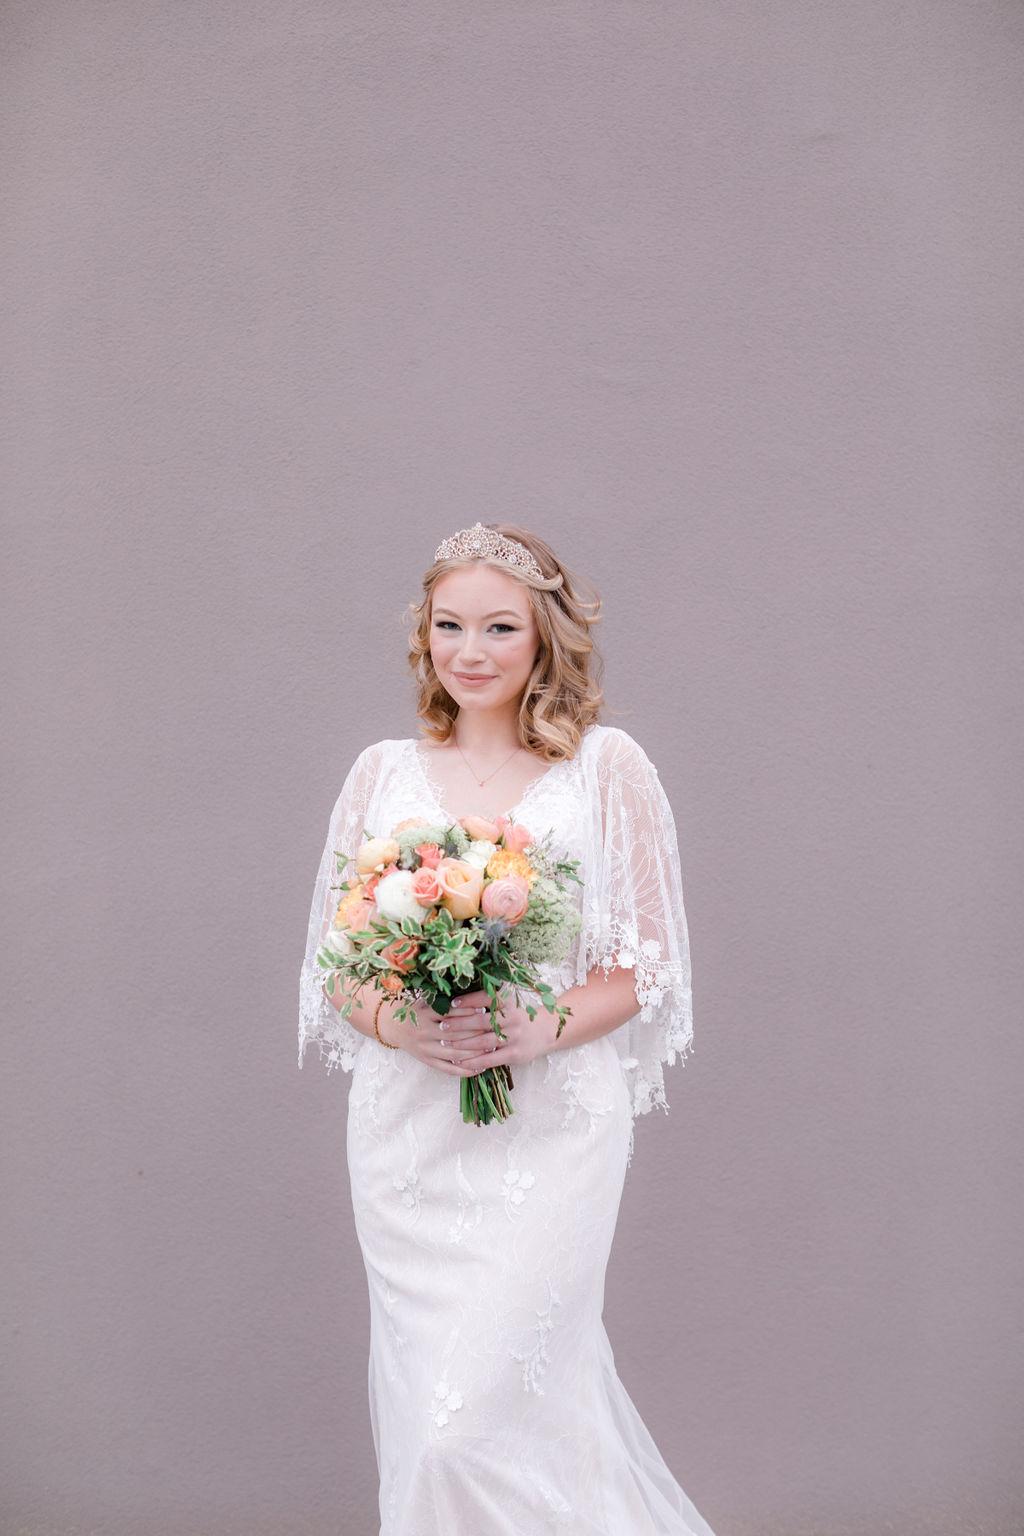 bride wearing boho wedding dress holding pastel colored bouquet